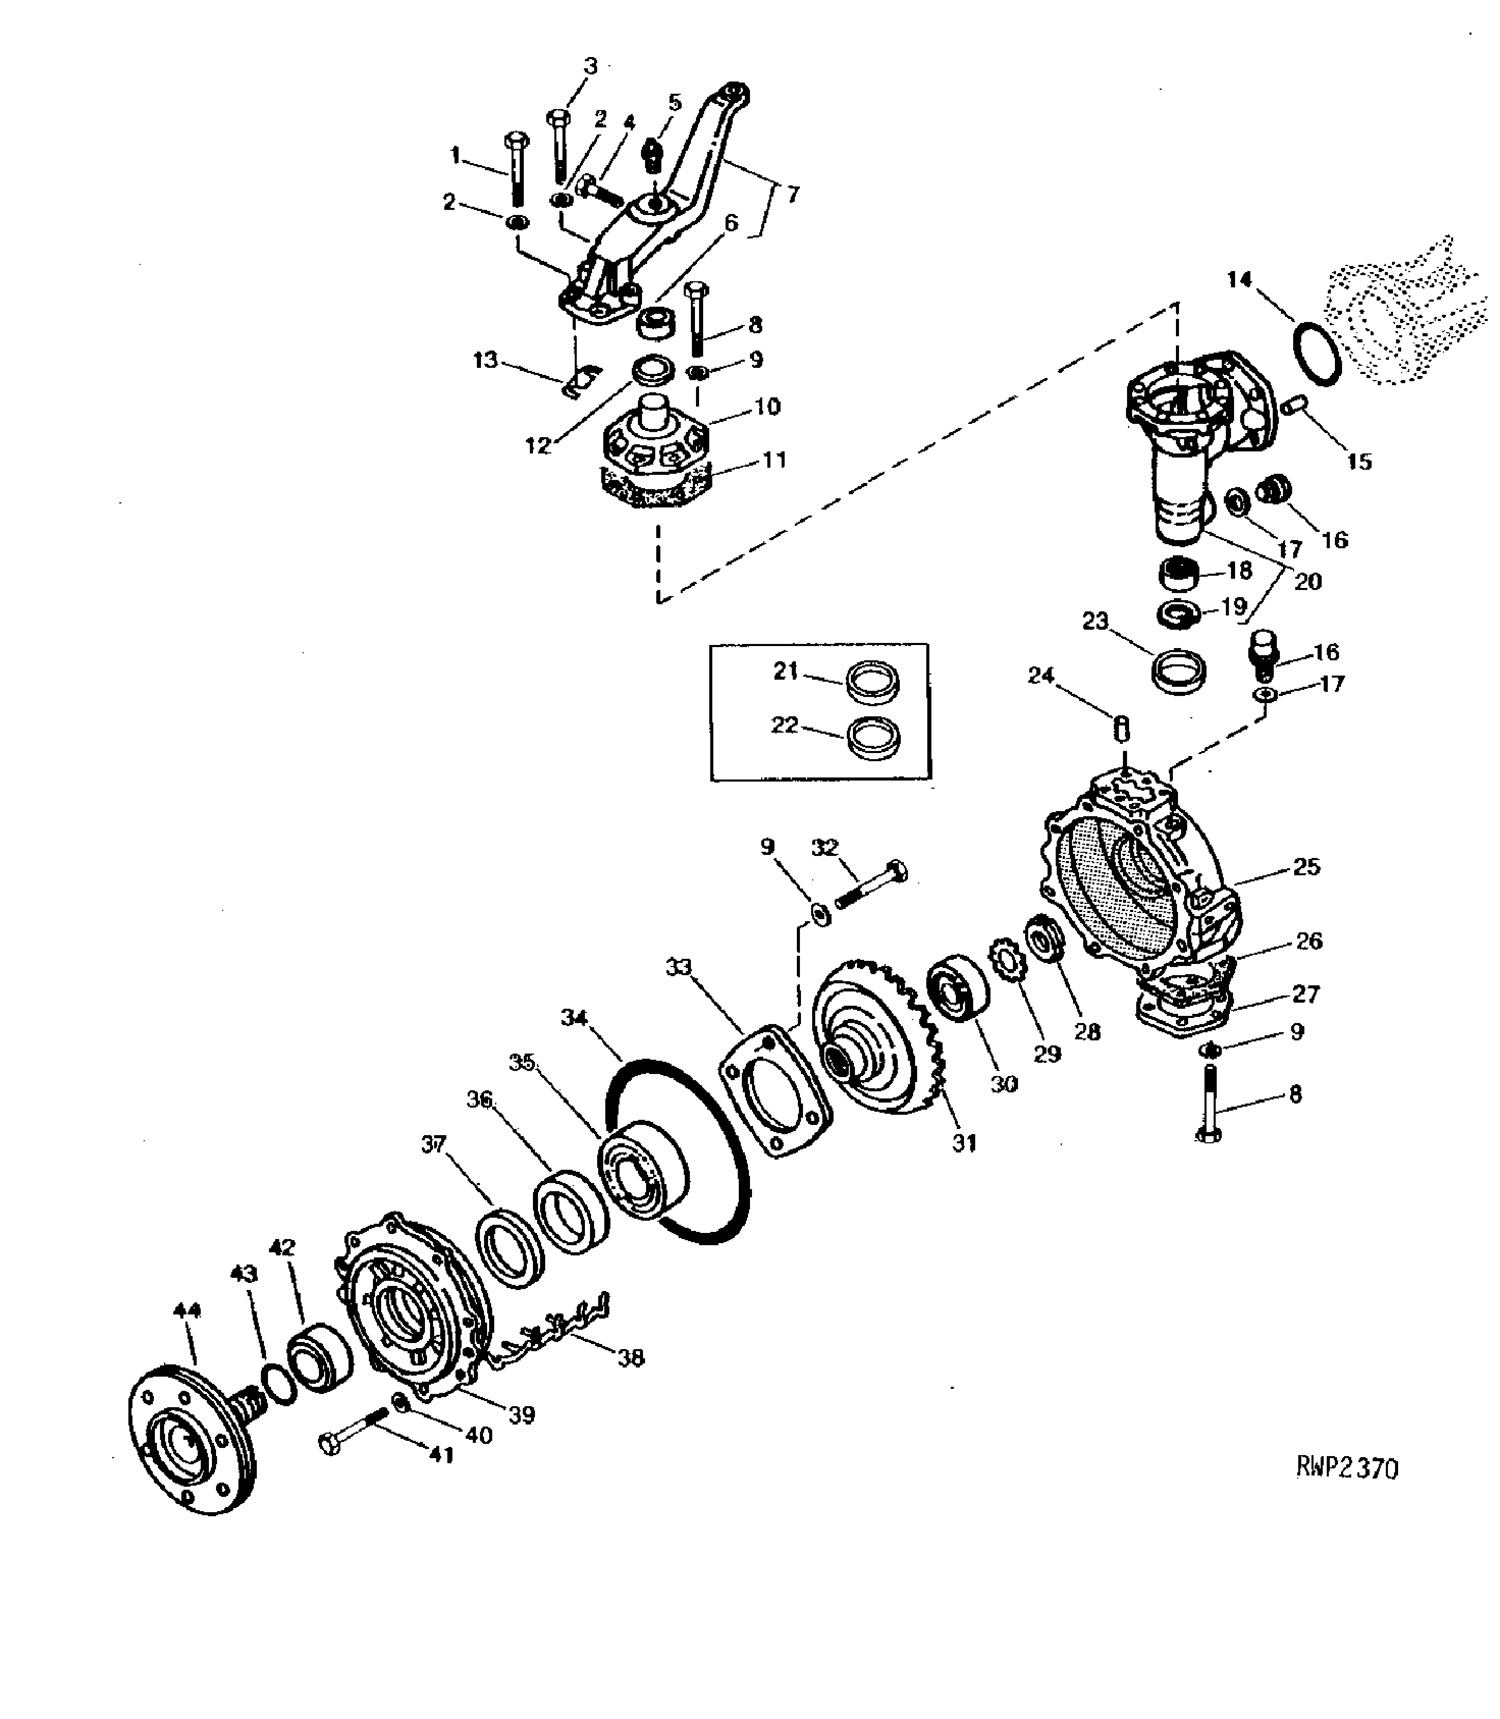 Front Axle Seals Amp Bearings For John Deere Compact Tractors